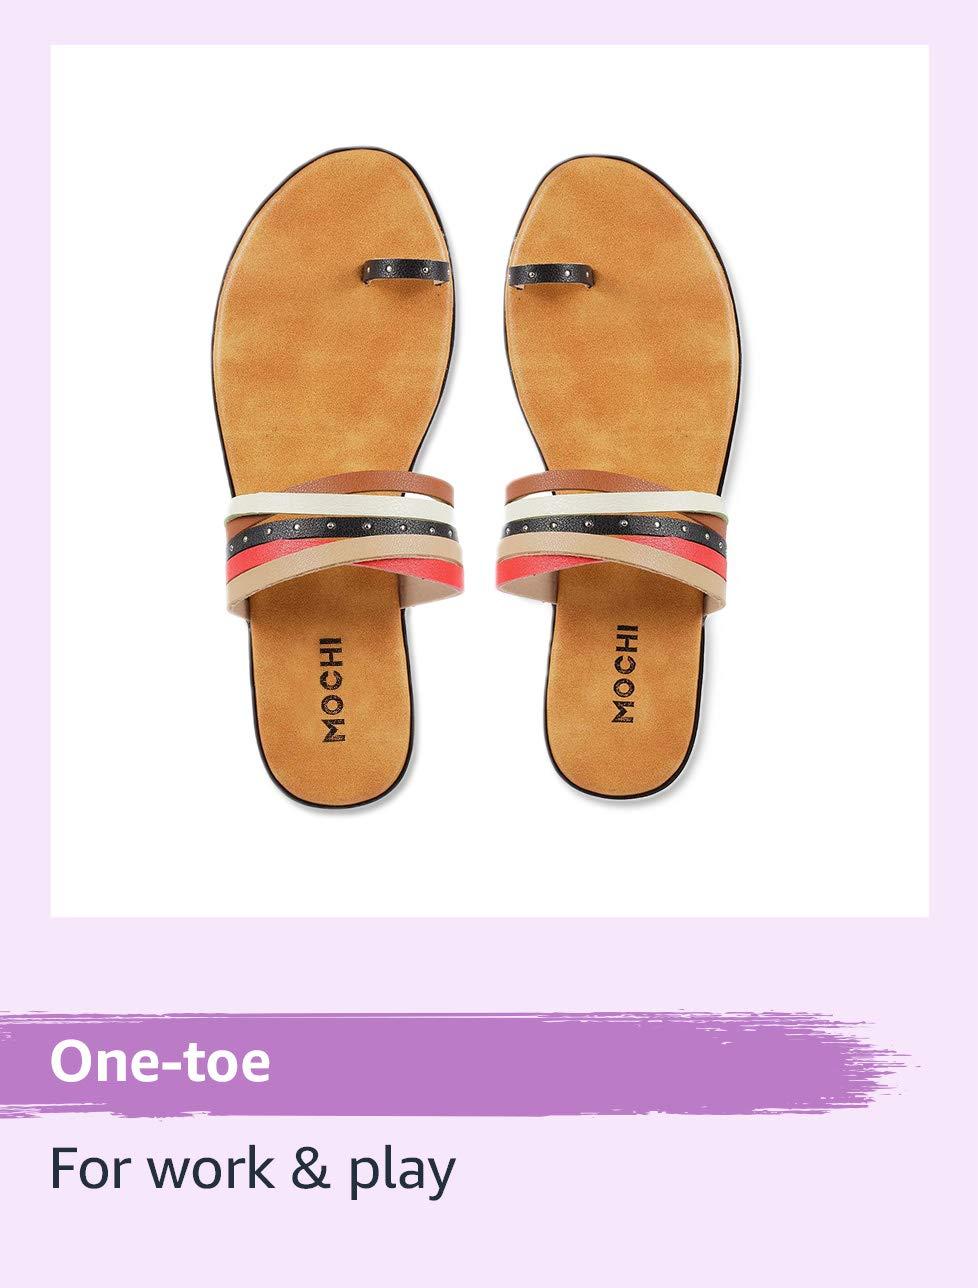 One toe